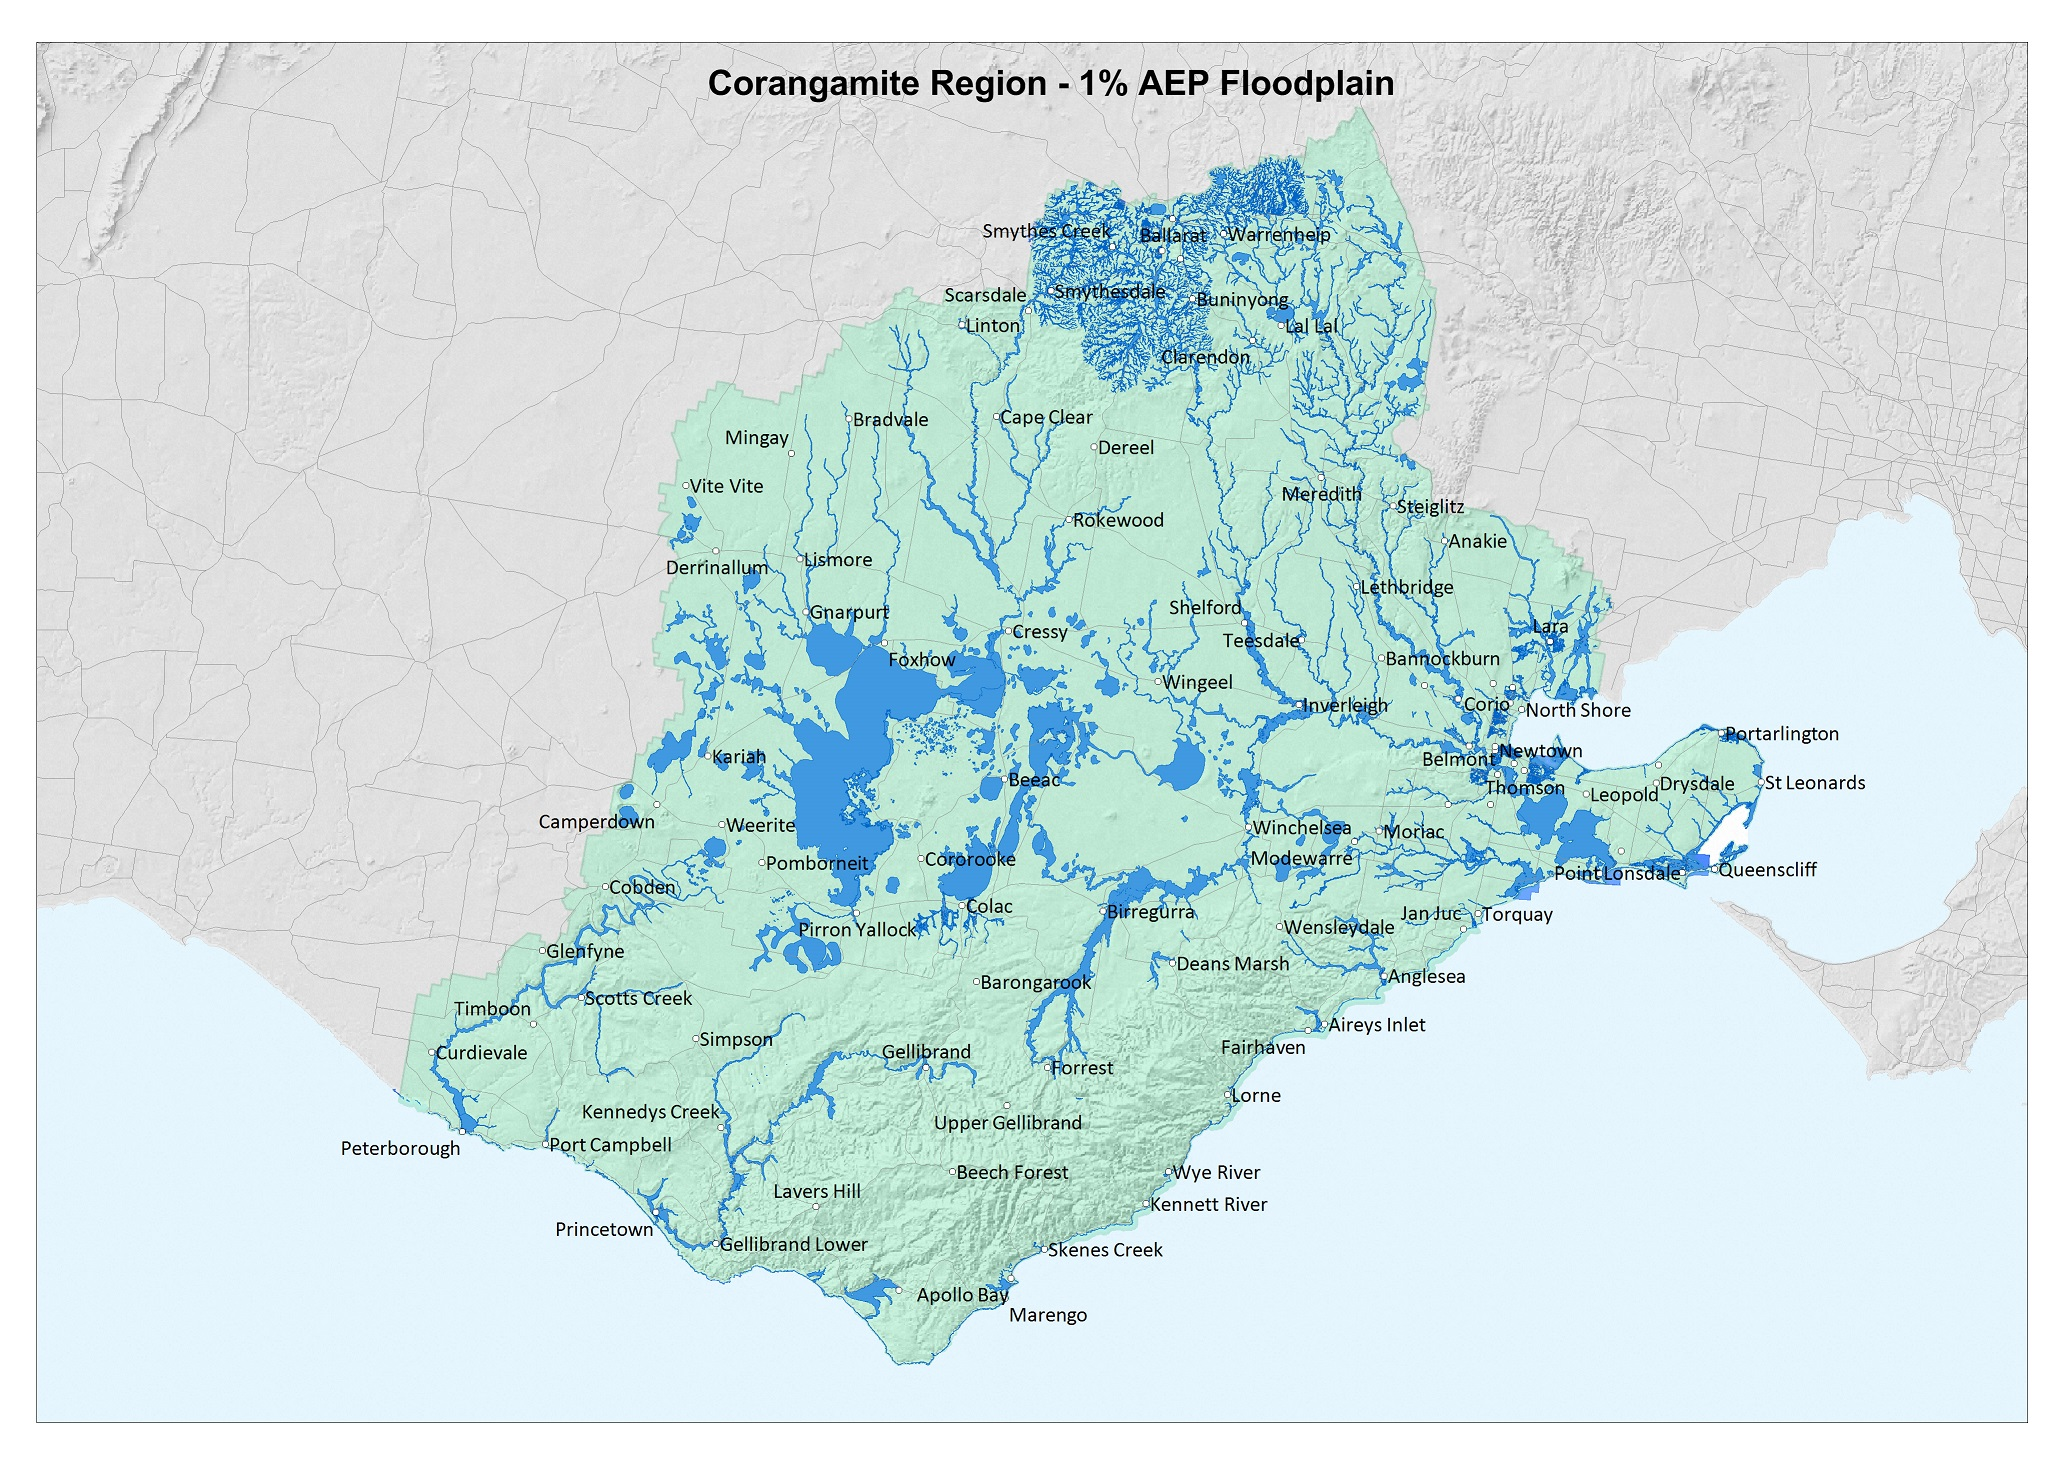 Map of the Corangamite Region